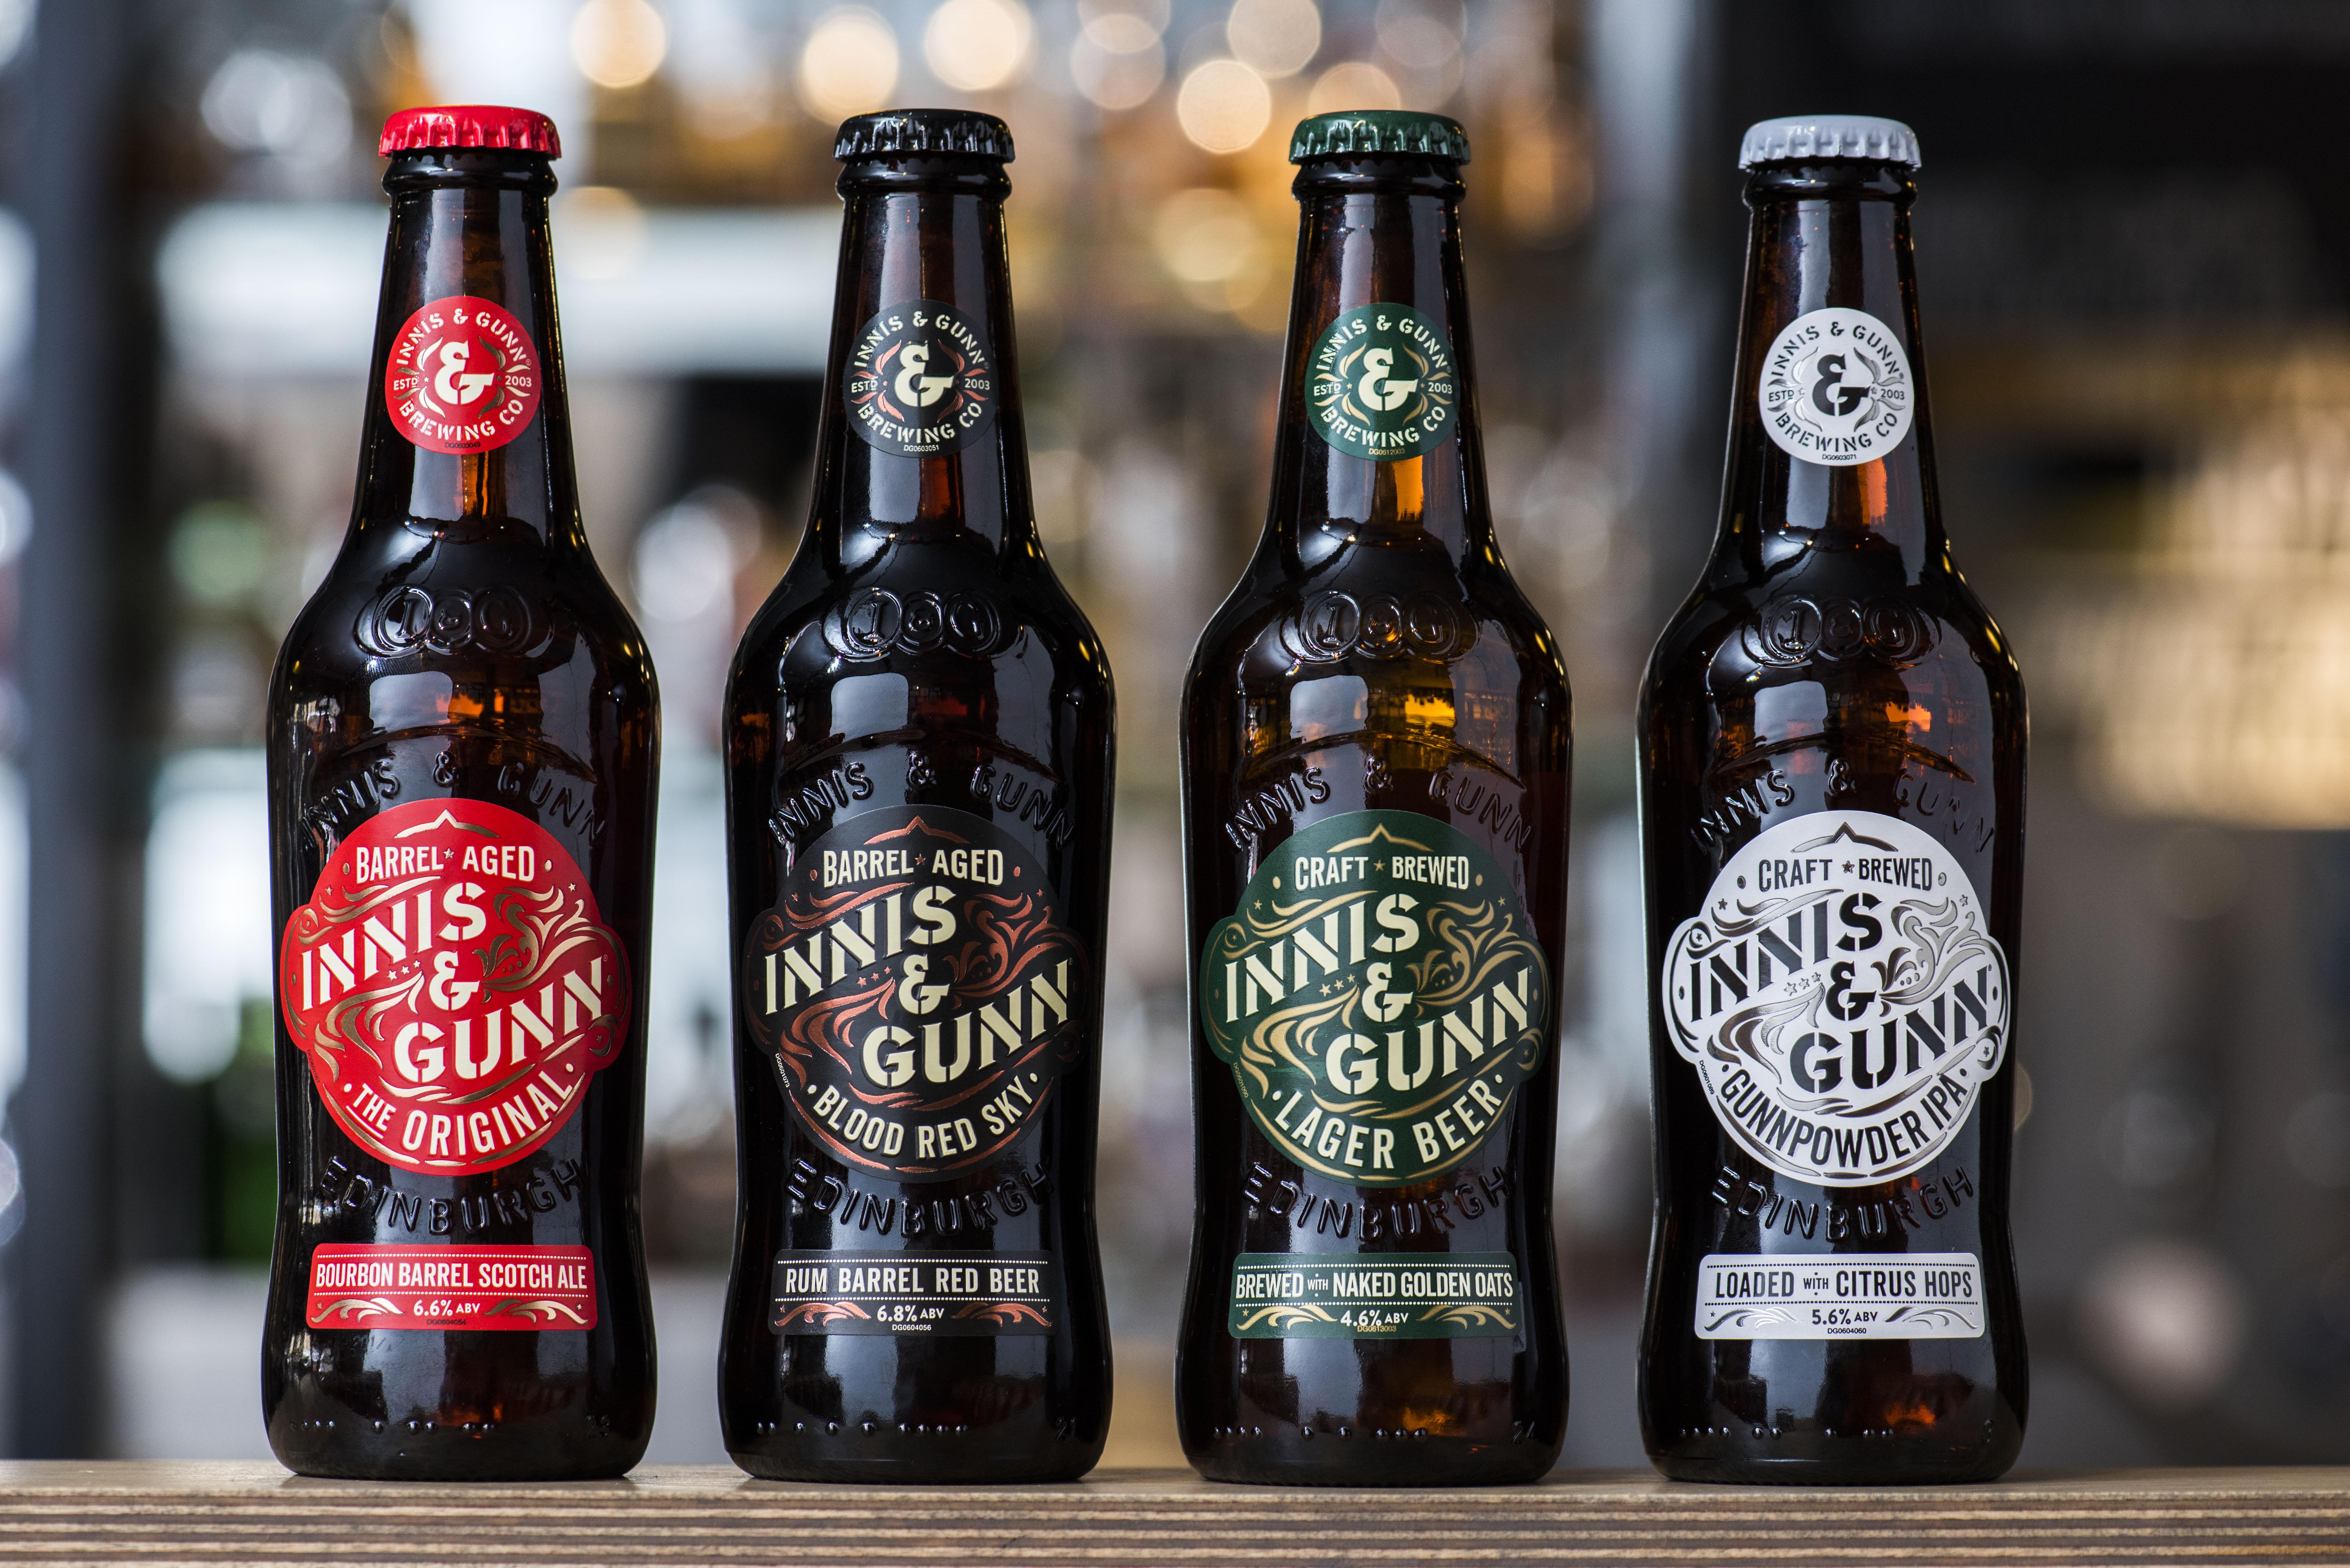 Innis & Gunn Defends ?barrel-aged? Claims photo